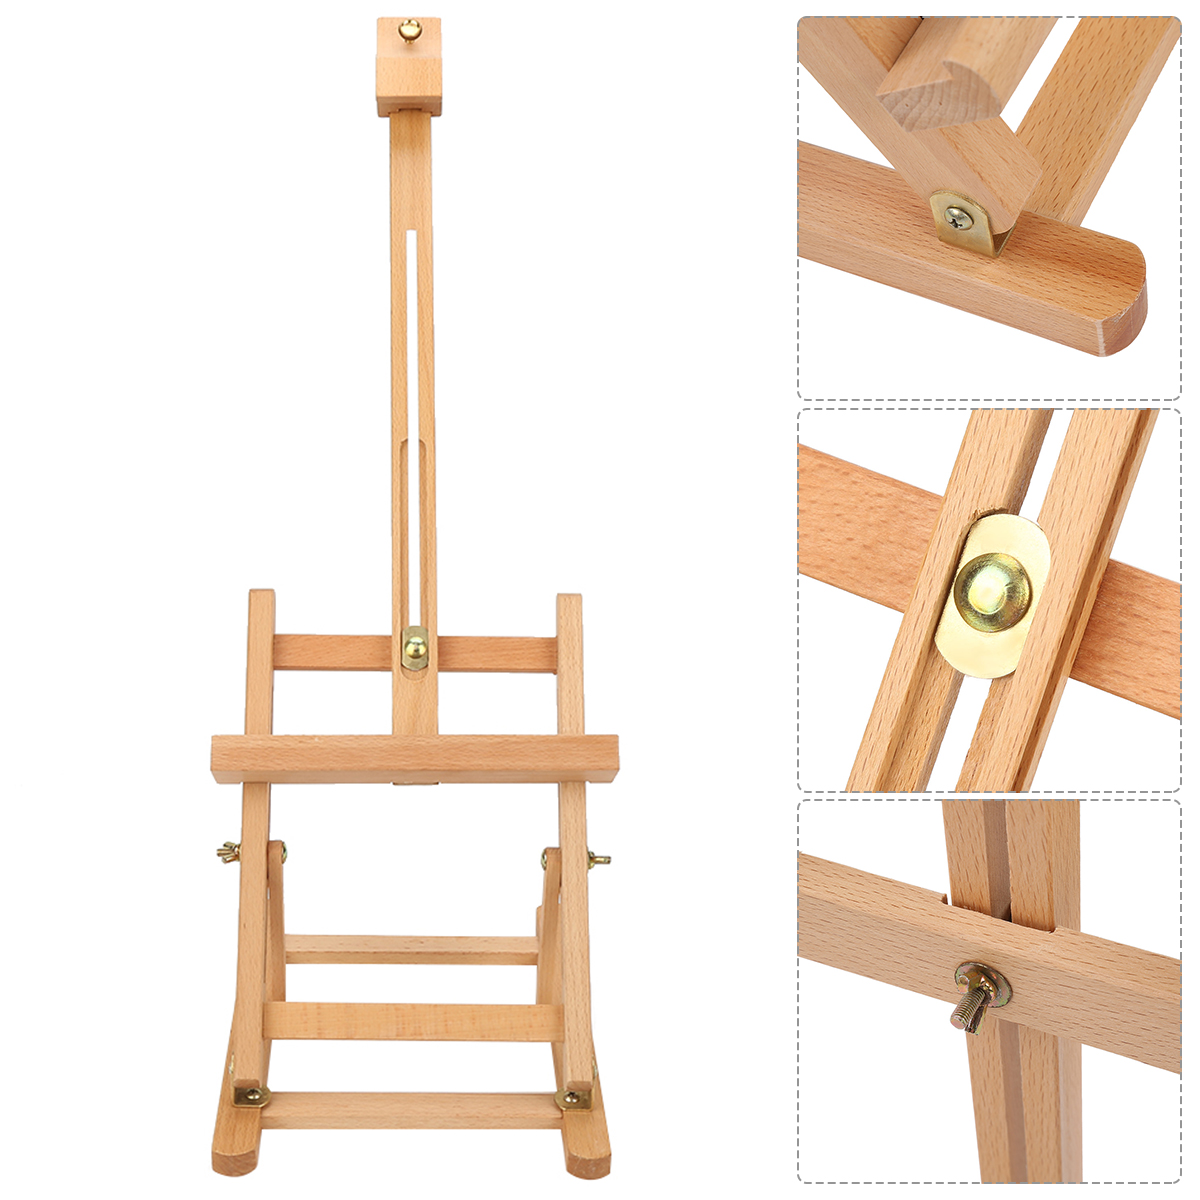 Adjustable Height Tabletop Wood Studio Art Easel Outdoor Folding H-Frame Easels Multifunctional Art Easel Artist Painting Tools